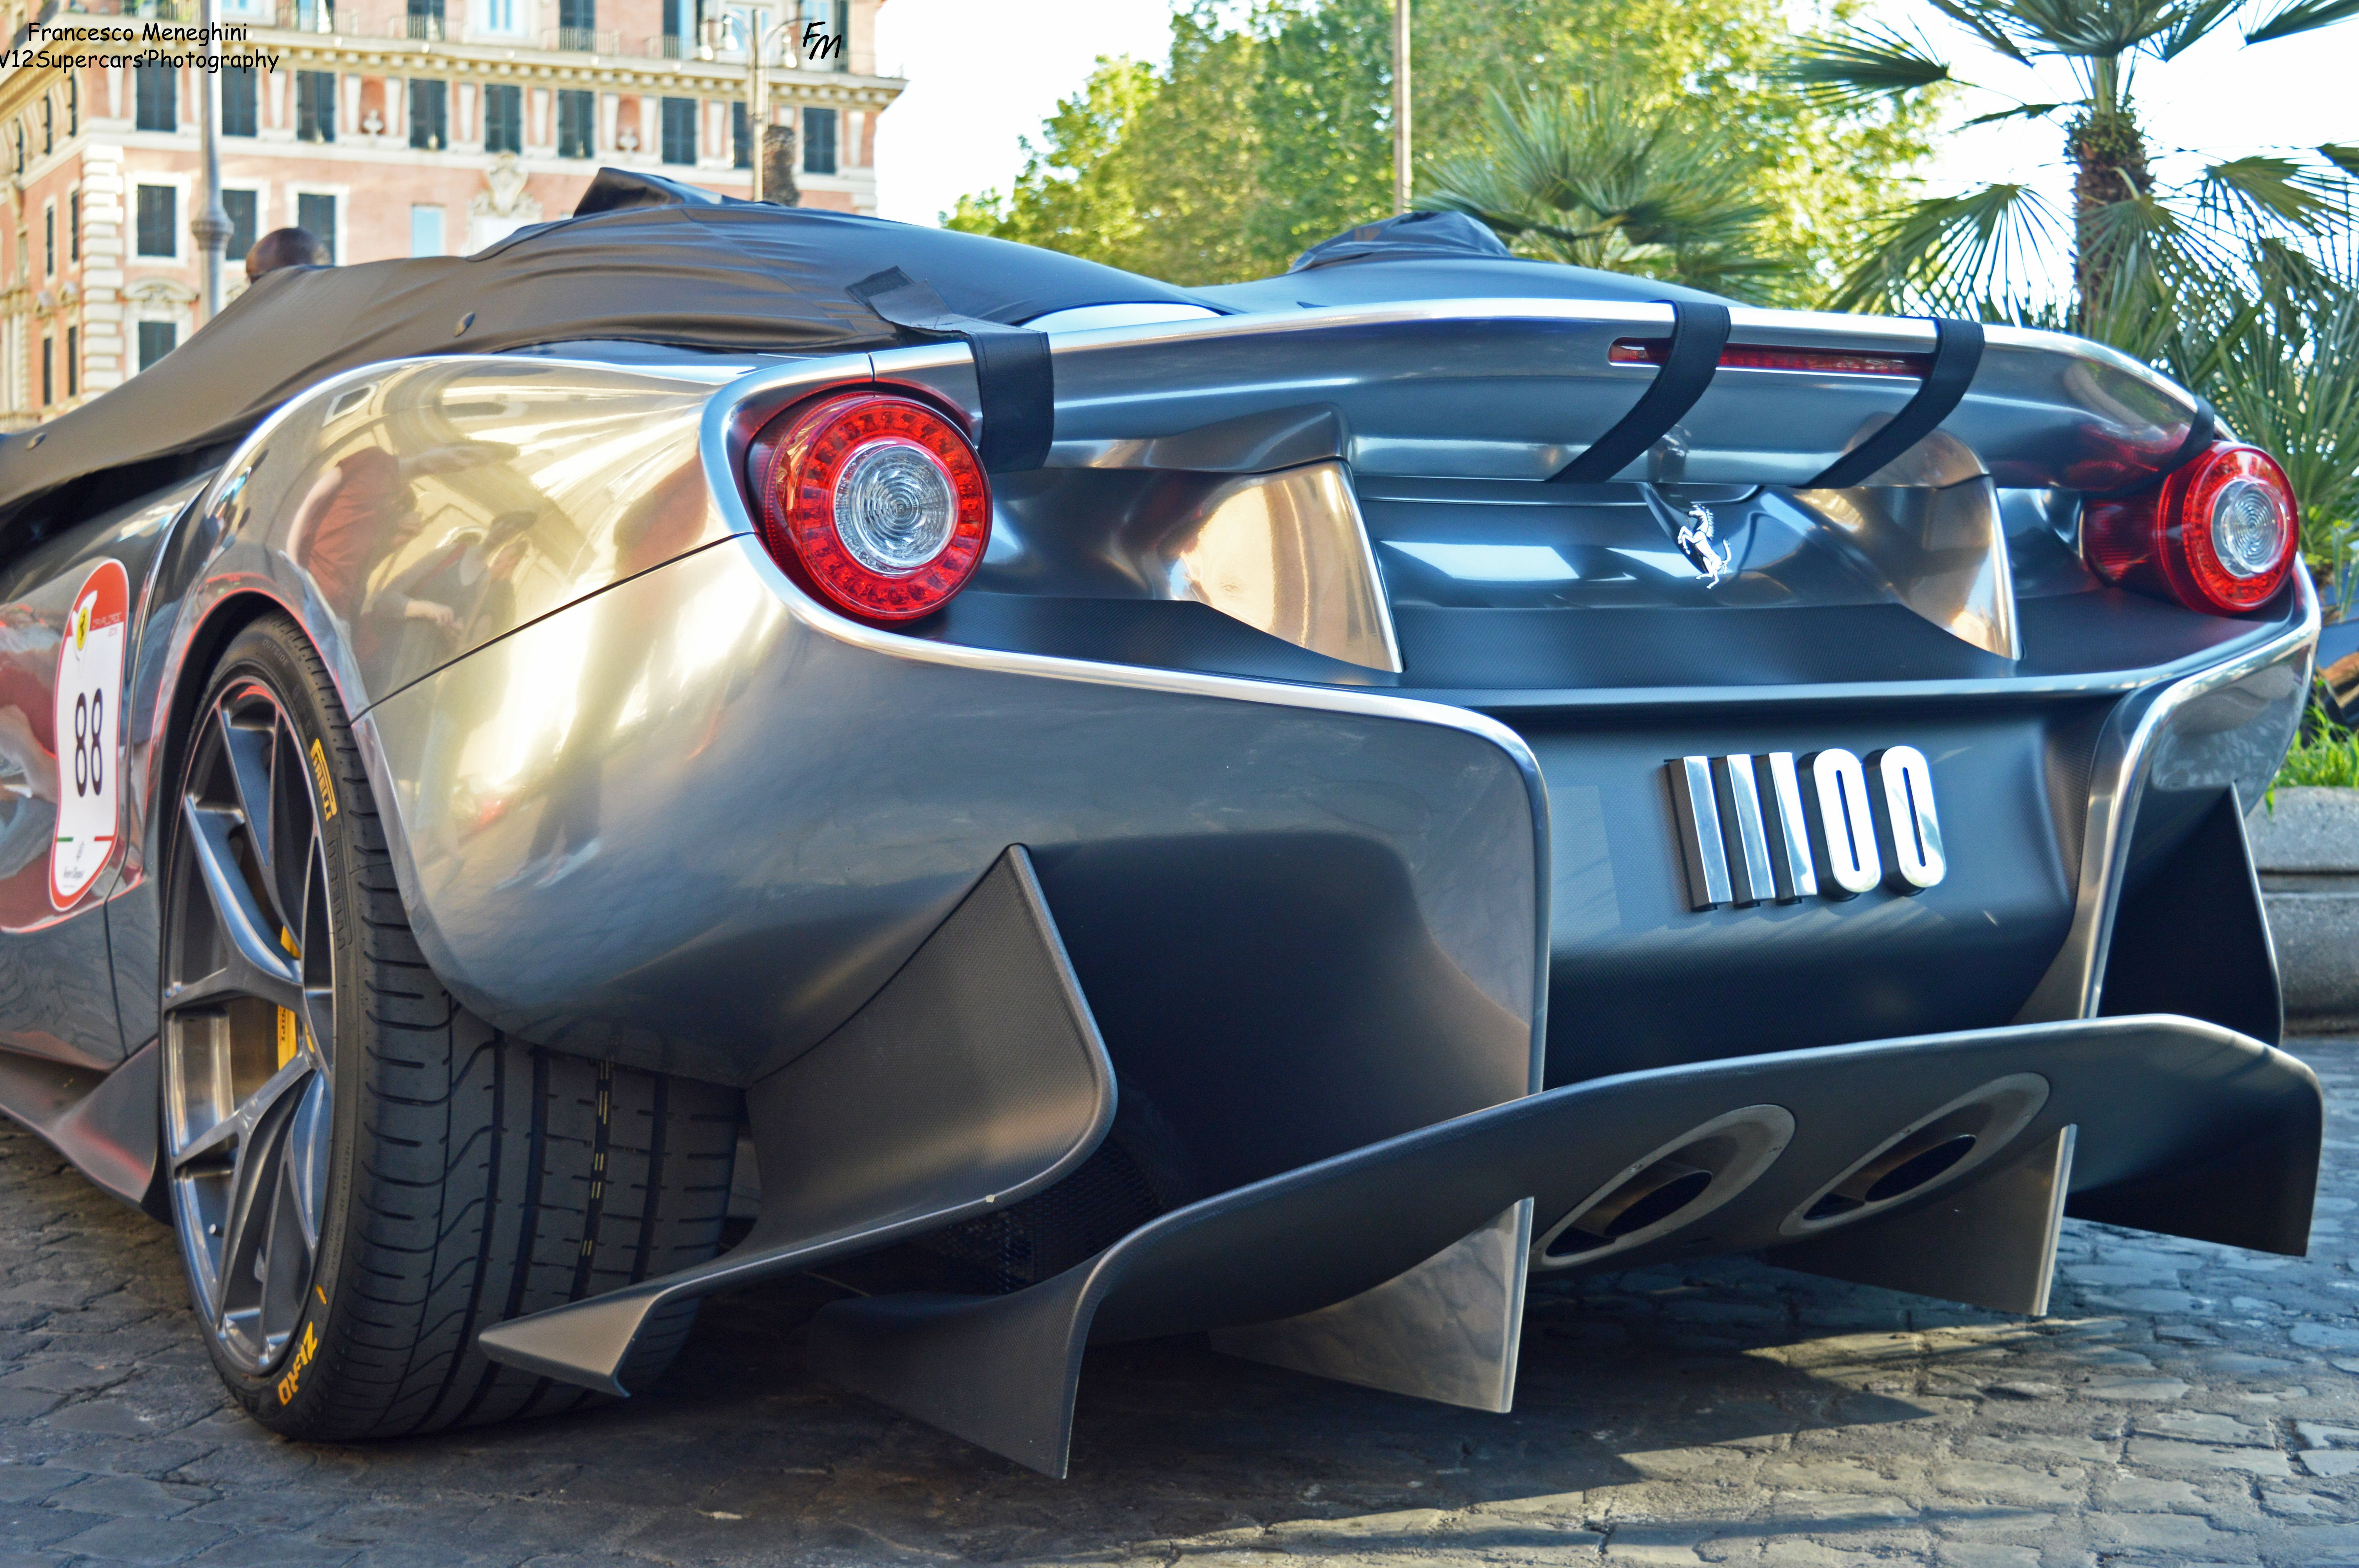 aaa rental rent new luxury car ferrari vanquish volante hire martin aston sport rome